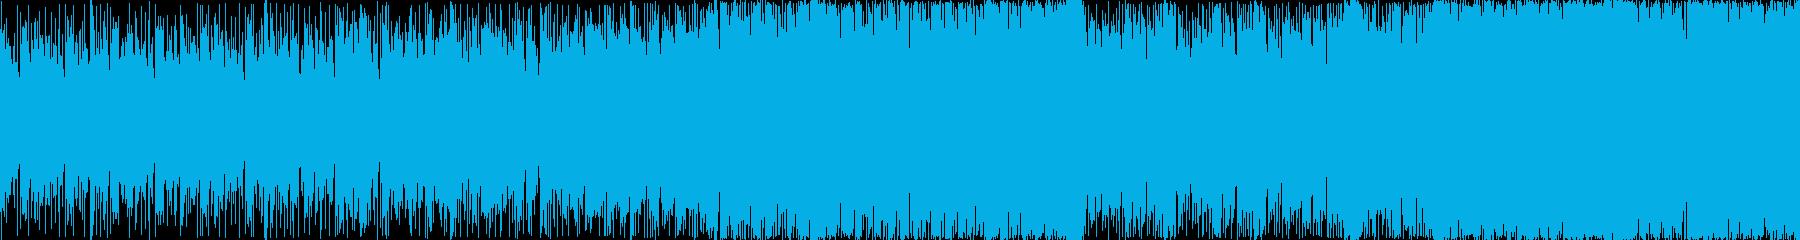 8bit音源 空を駆ける飛行艇 LOOPの再生済みの波形